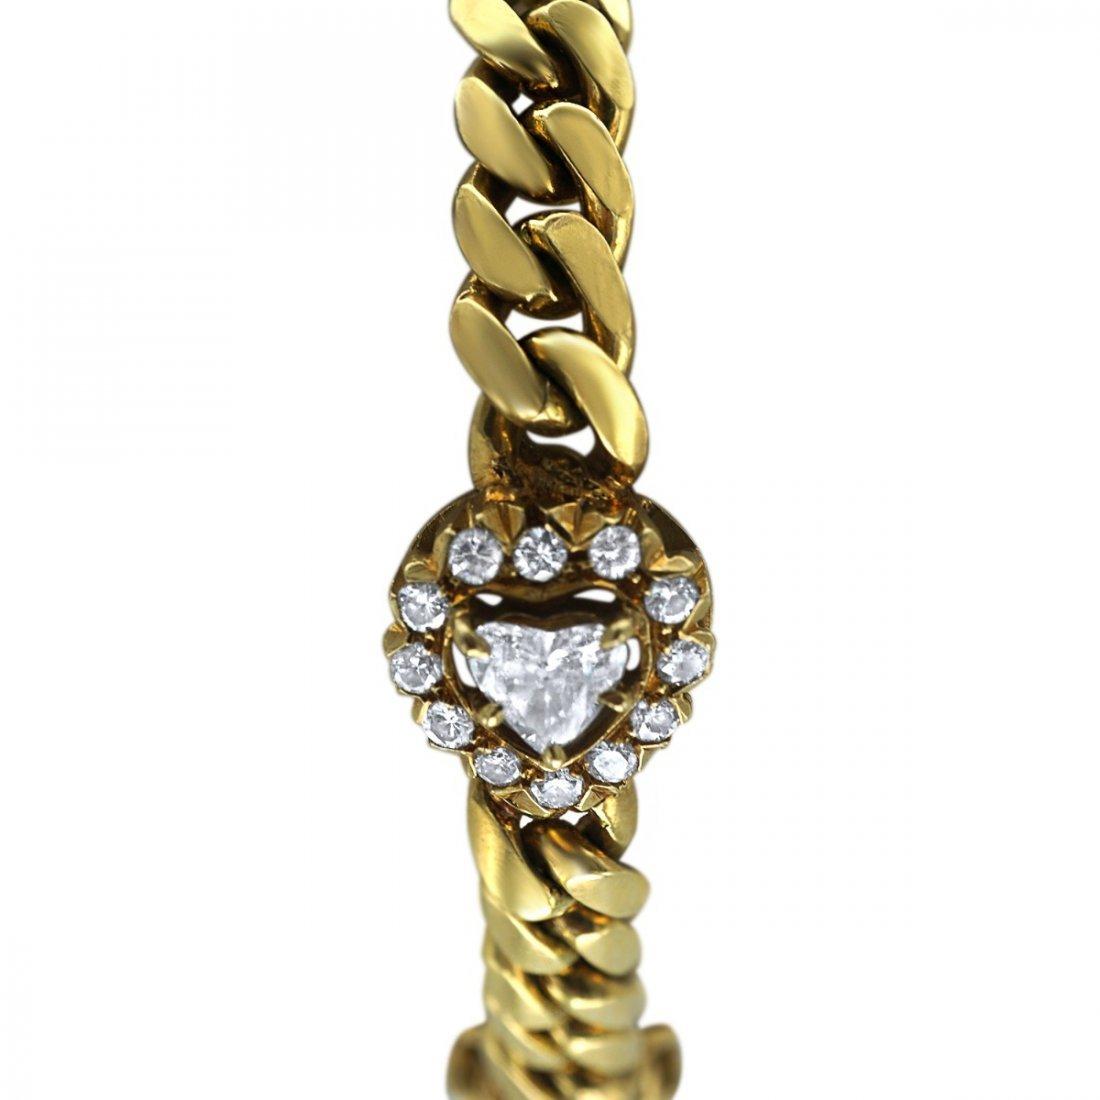 DIAMOND AND 18 KARAT GOLD BRACELET